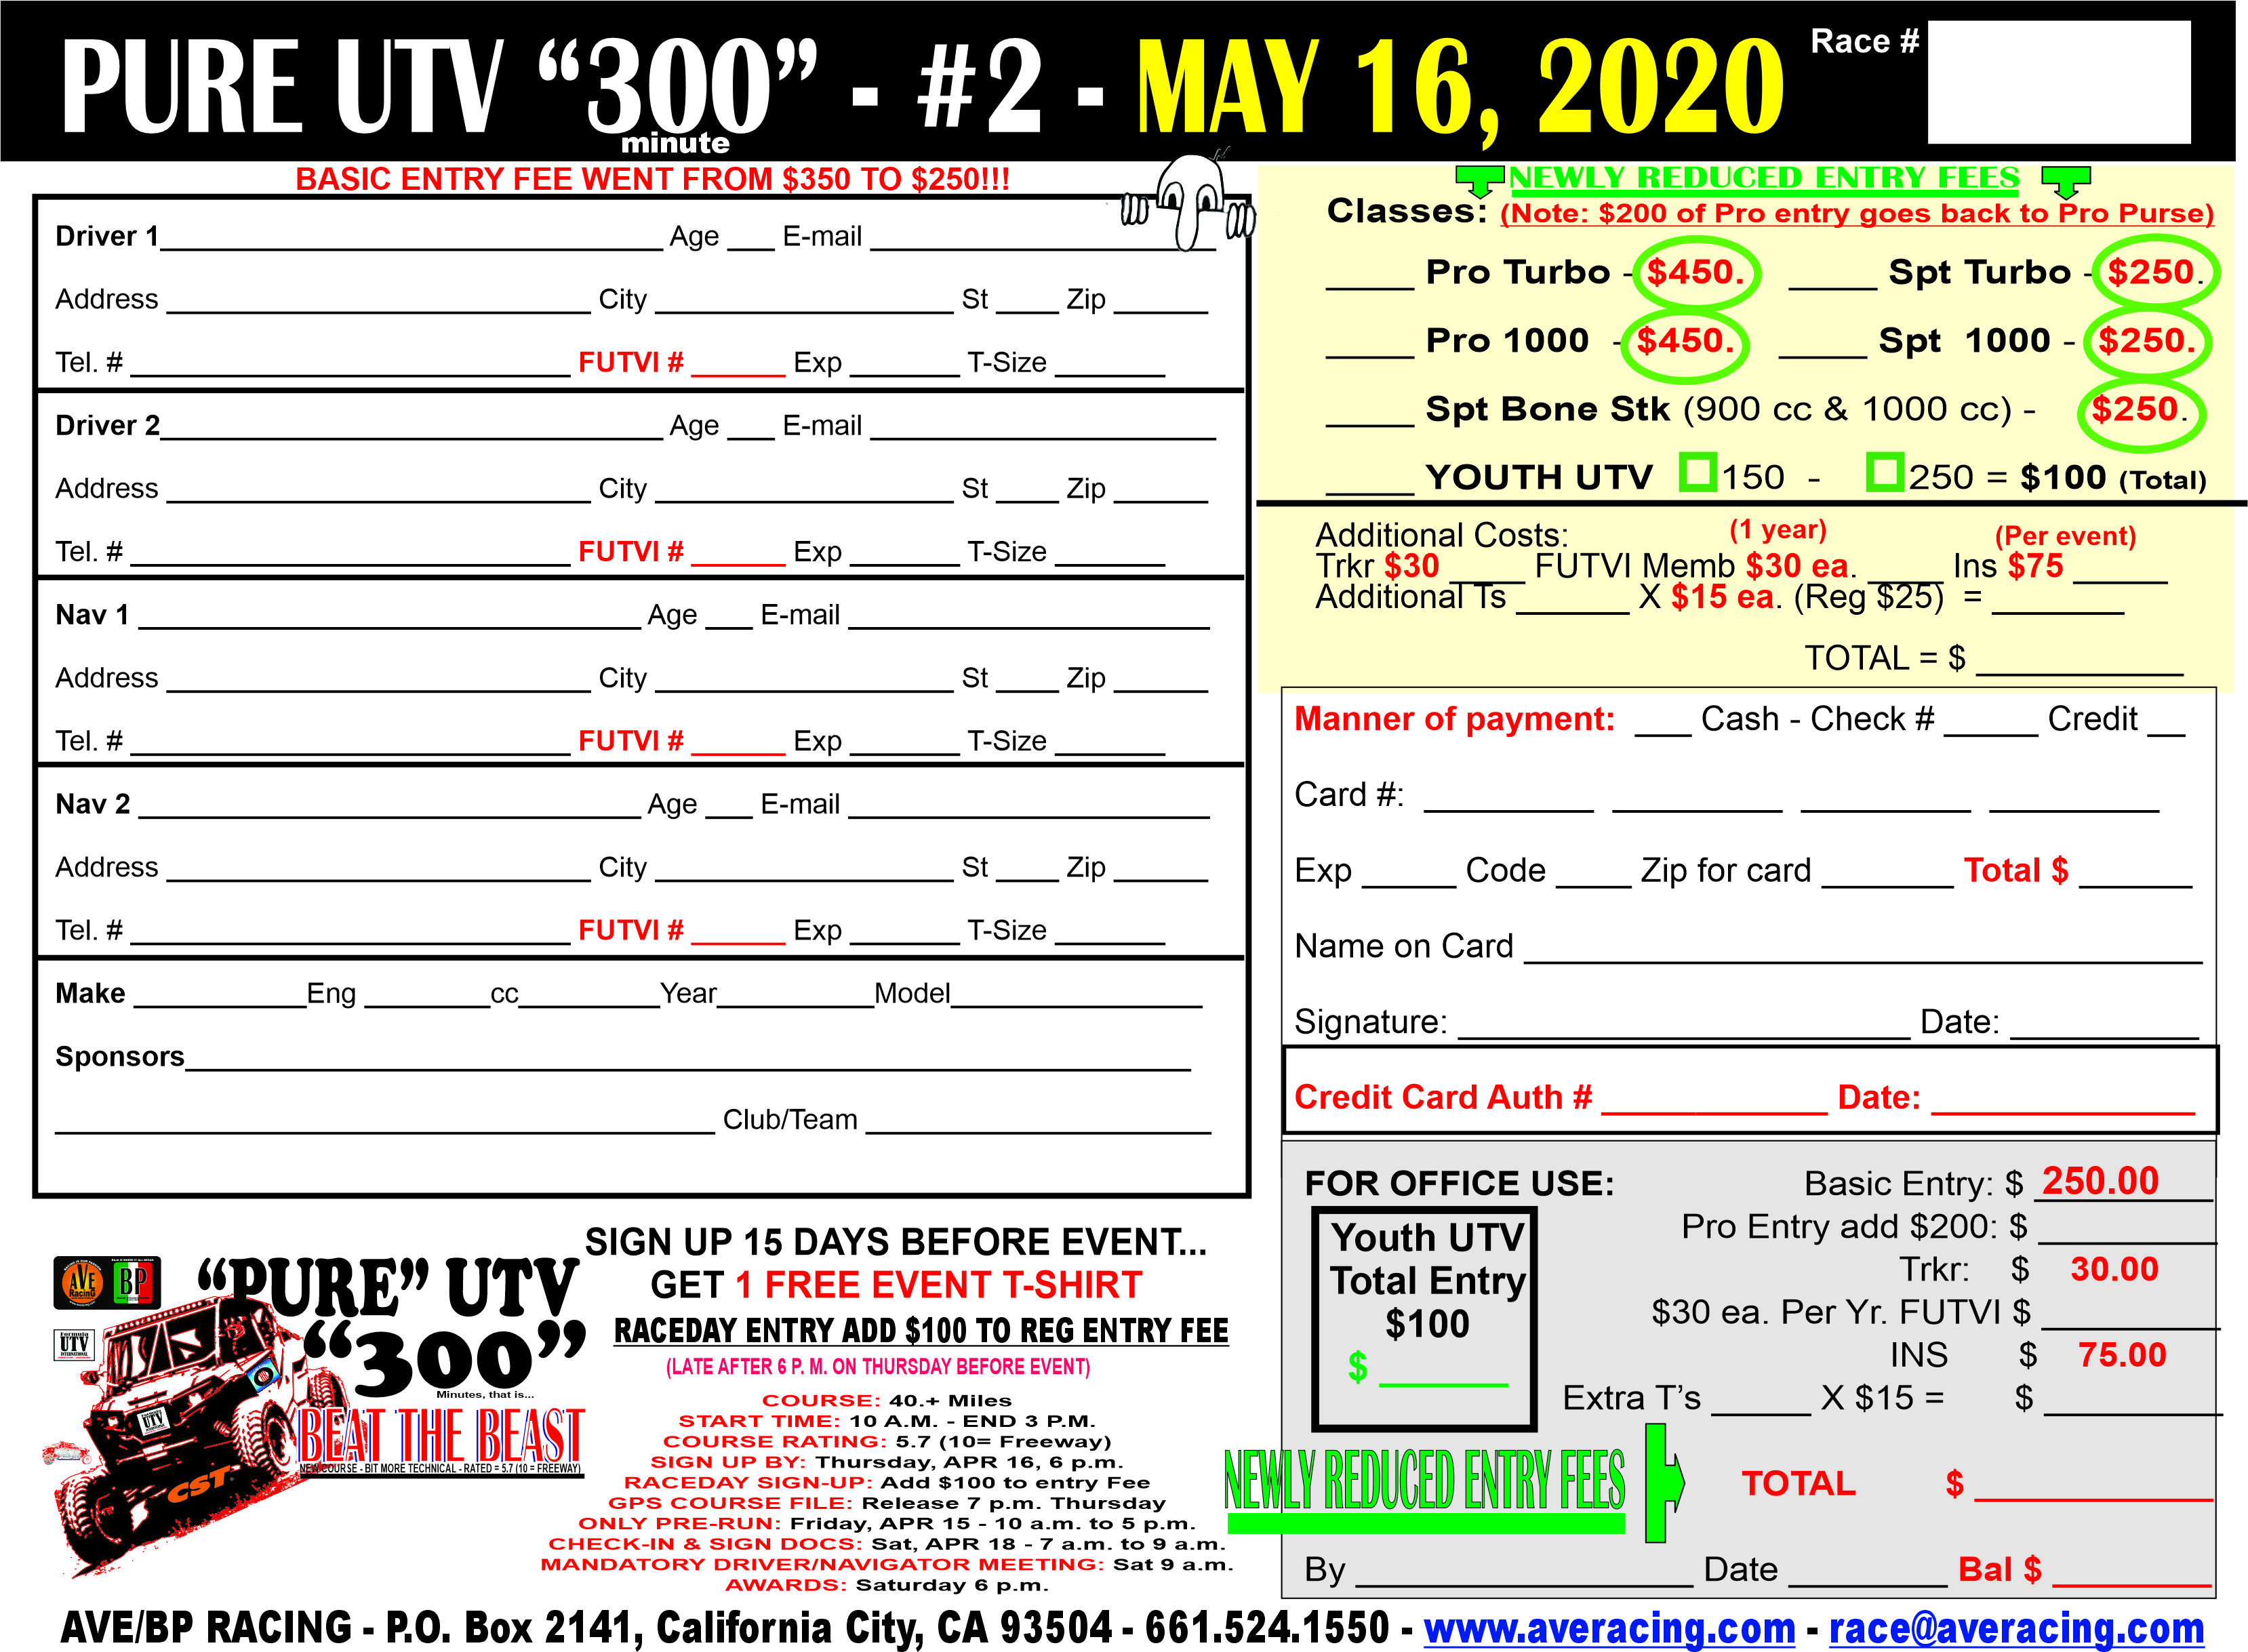 20-P300-#2-REG&YOUTH-ENTRY-UPDATED-X2--APR8.jpg